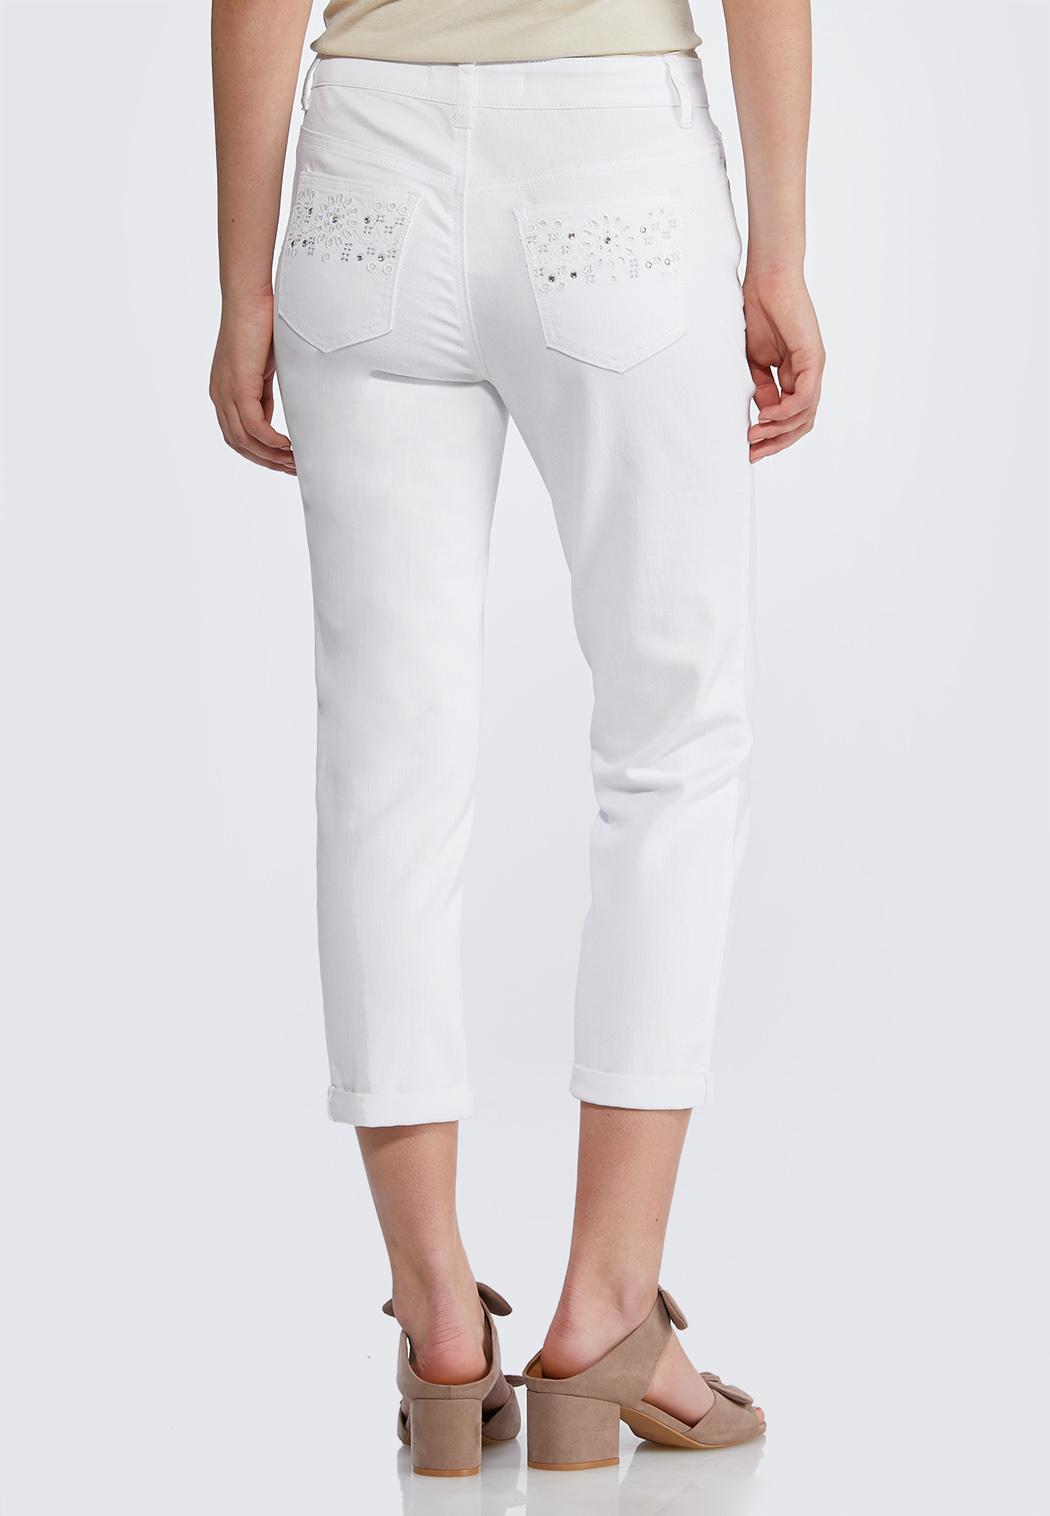 Cropped Embellished Jeans